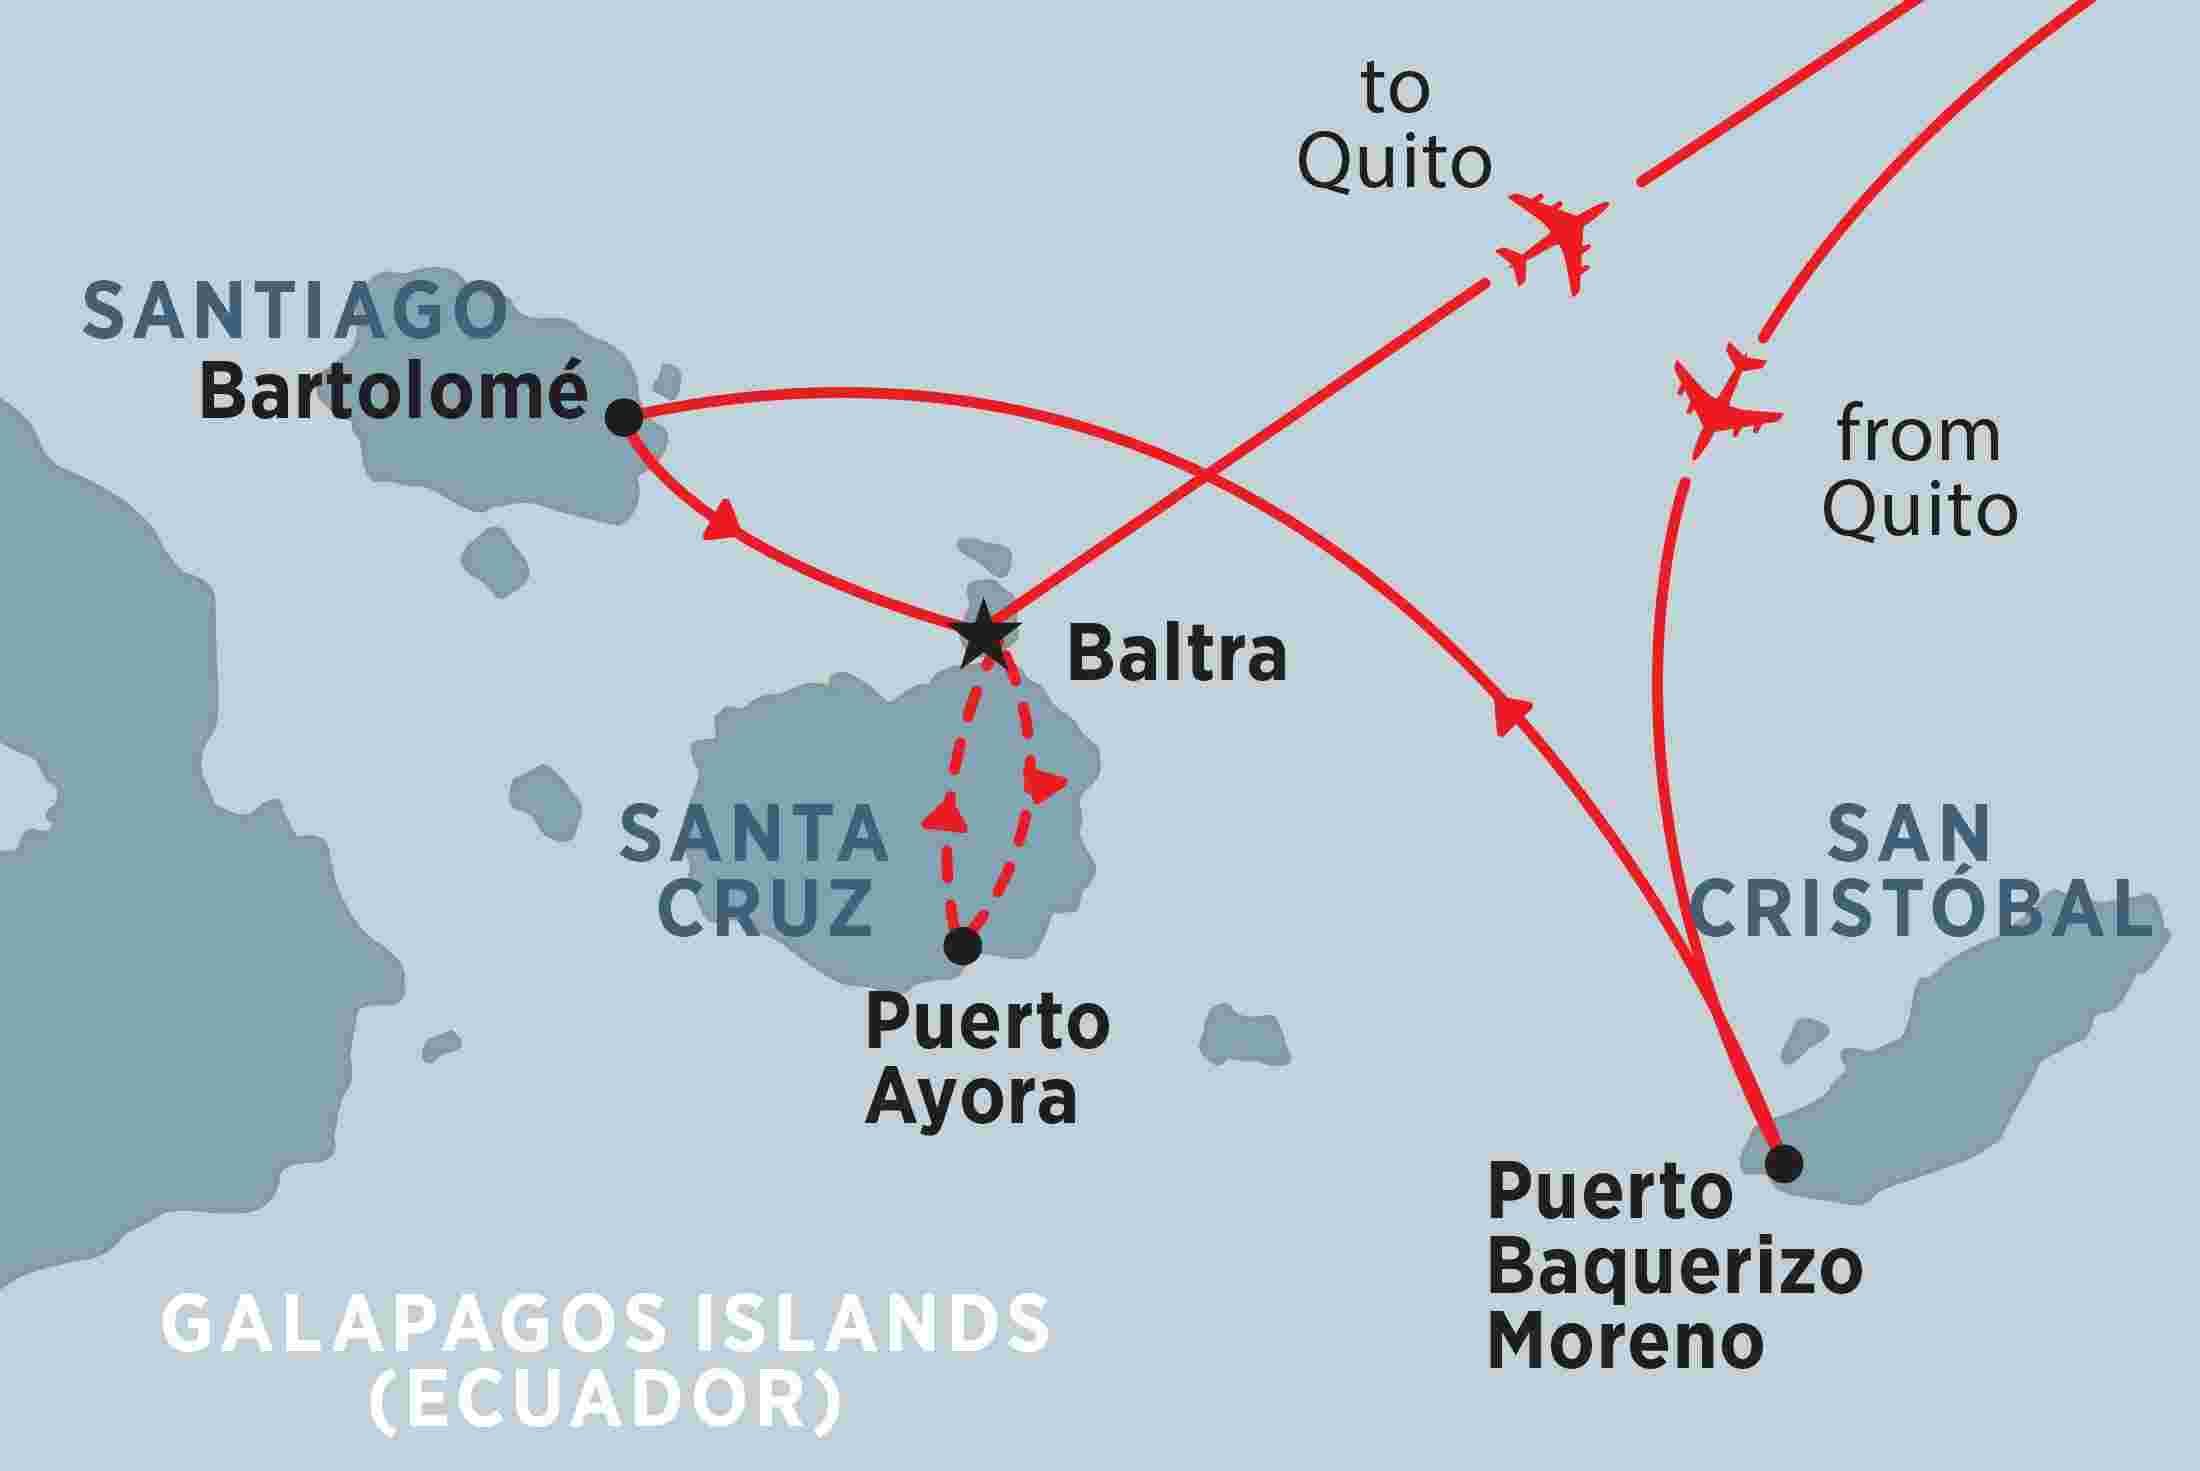 Galapagos Encounter Central Islands Grand Queen Beatriz Overview Galapagos Encounter Central Islands Grand Queen Beatriz